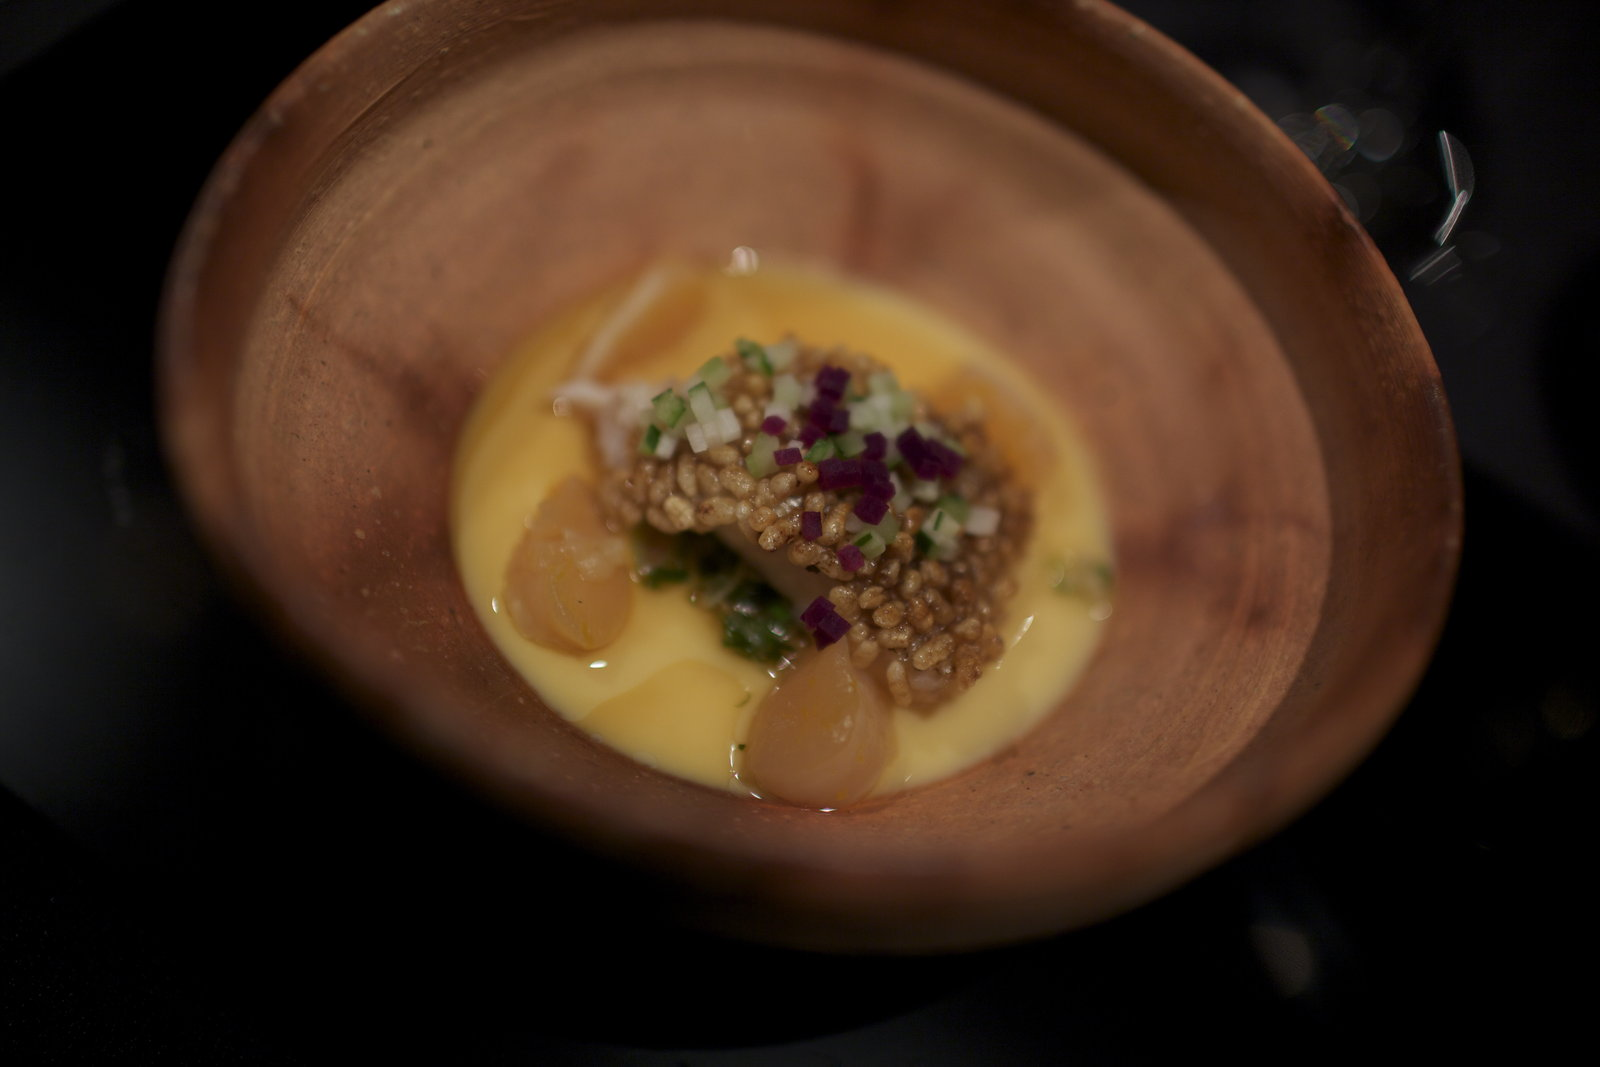 RyuGin - Crispy charrilled Akamatsu with vinegar flavor on egg pudding with smooth taro potatoes